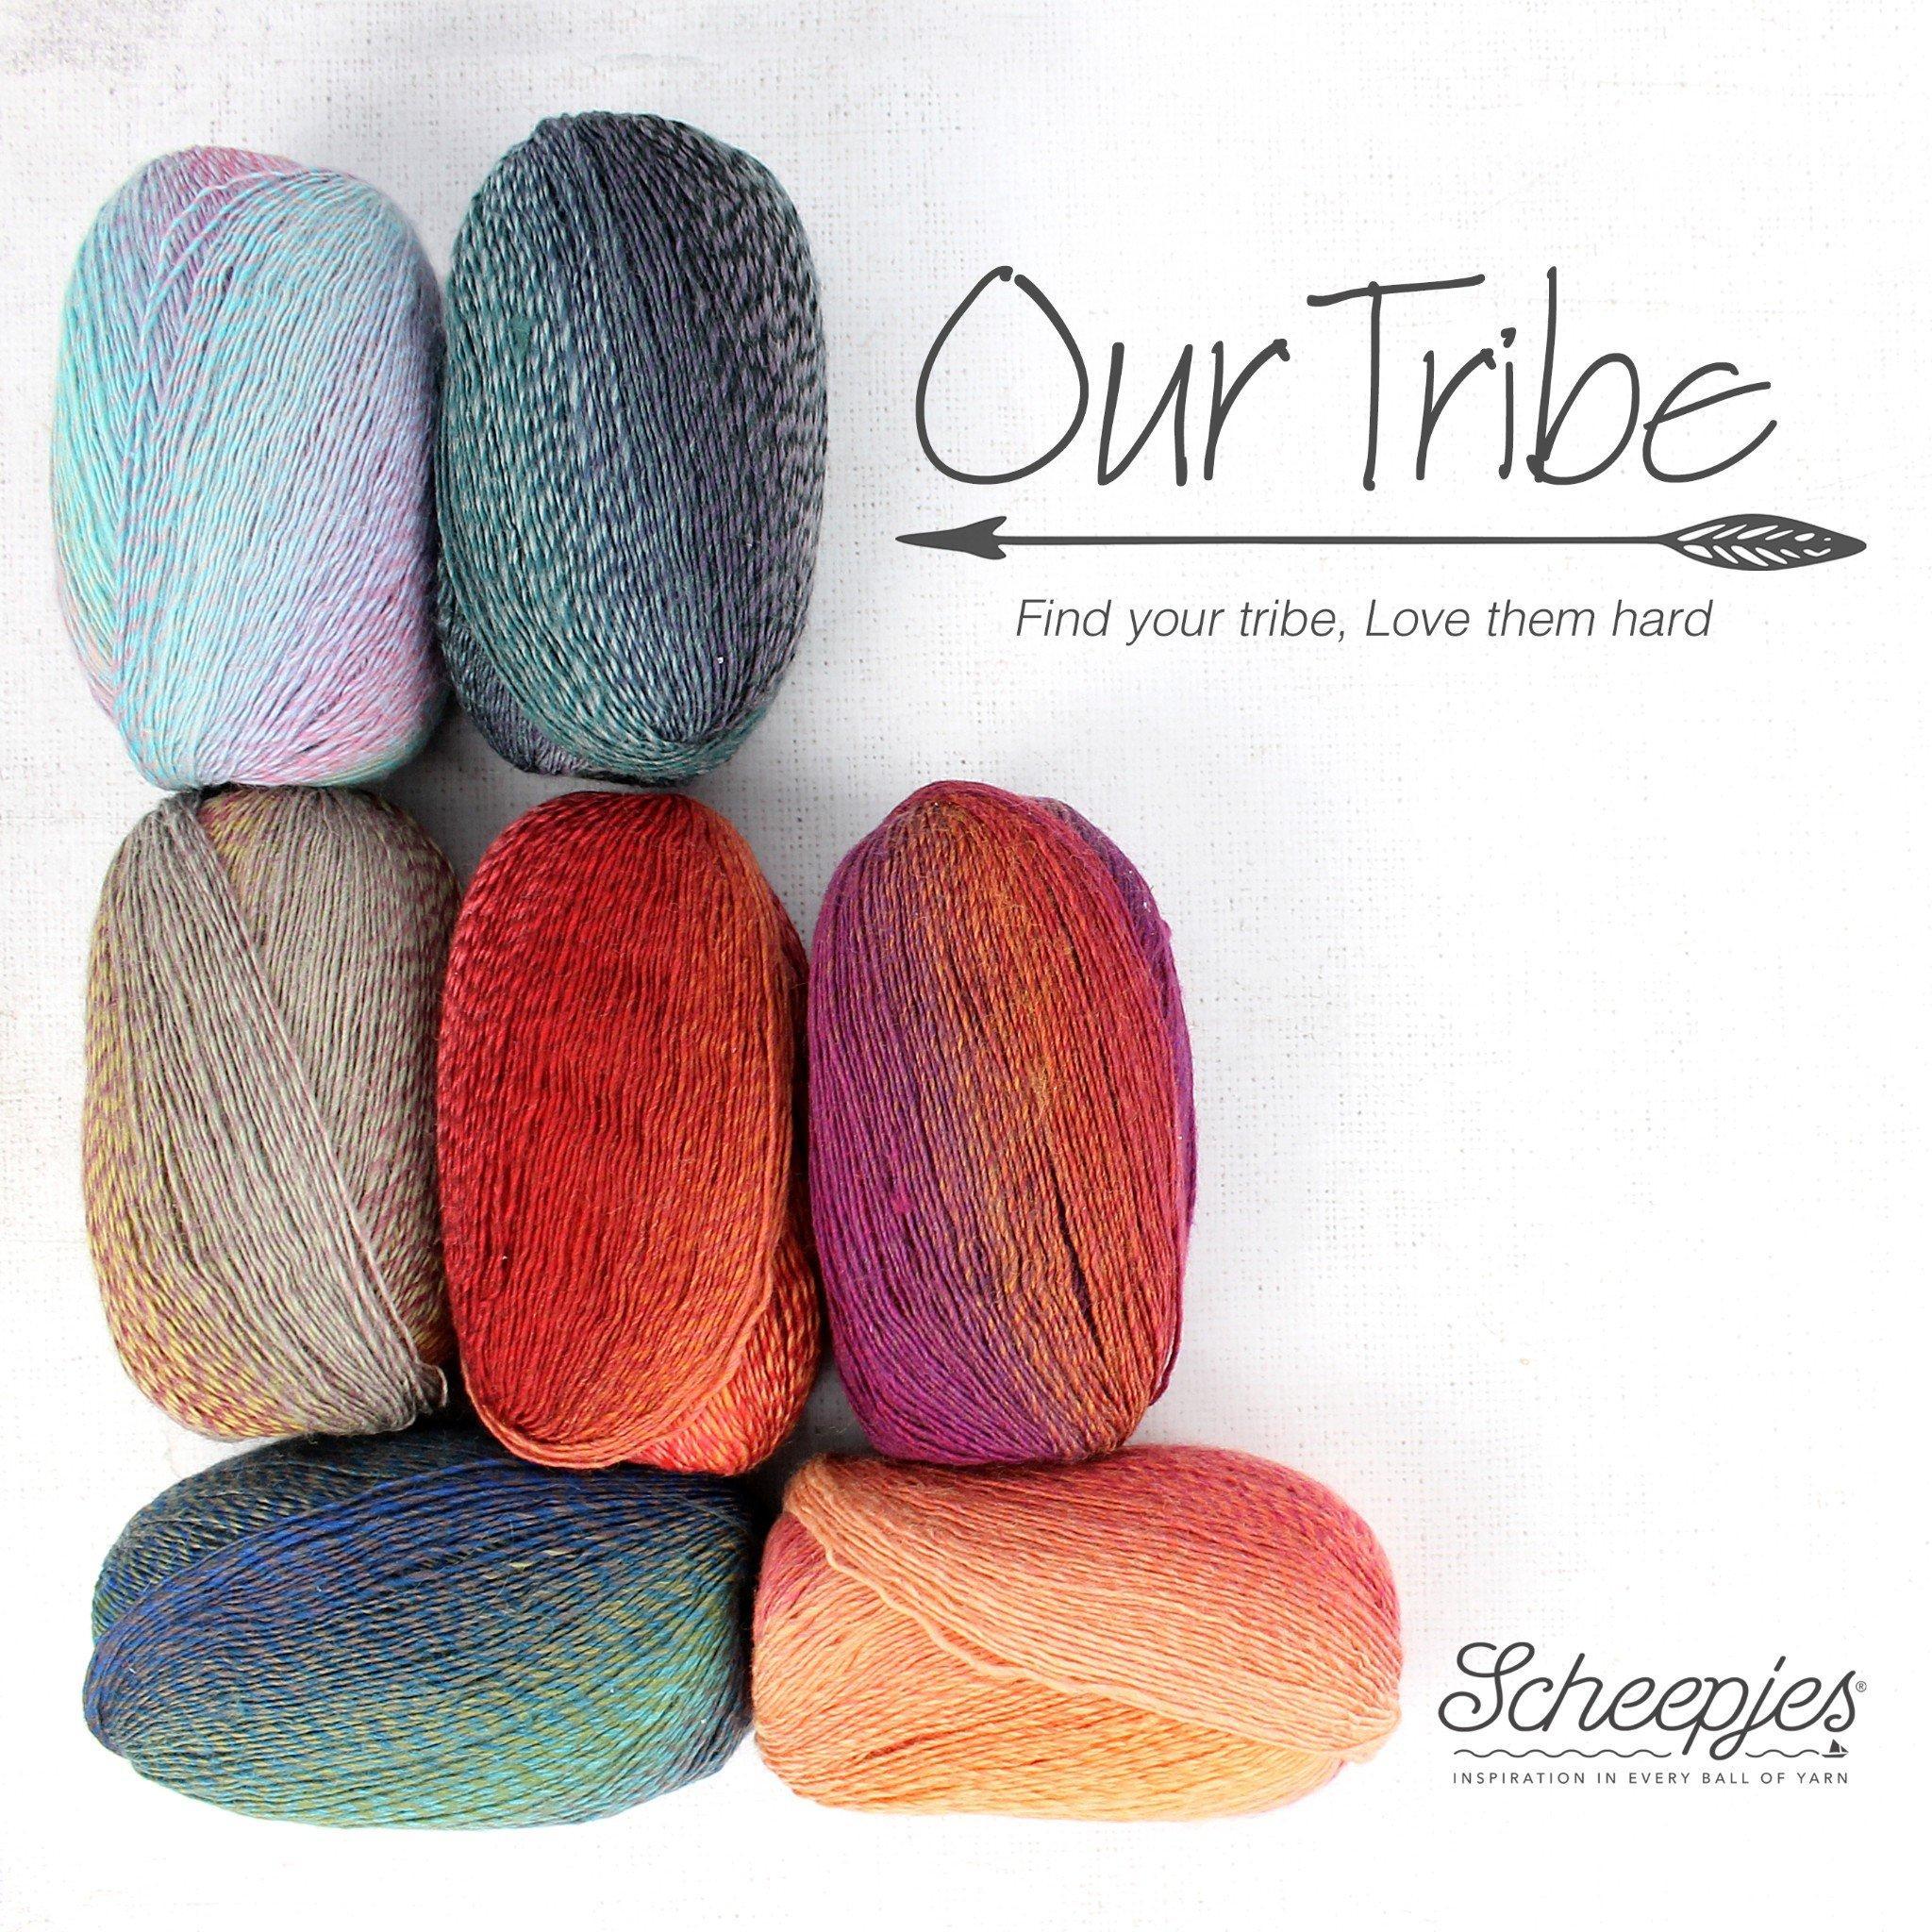 Scheepjes Our Tribe - Haak Maar Raak 663